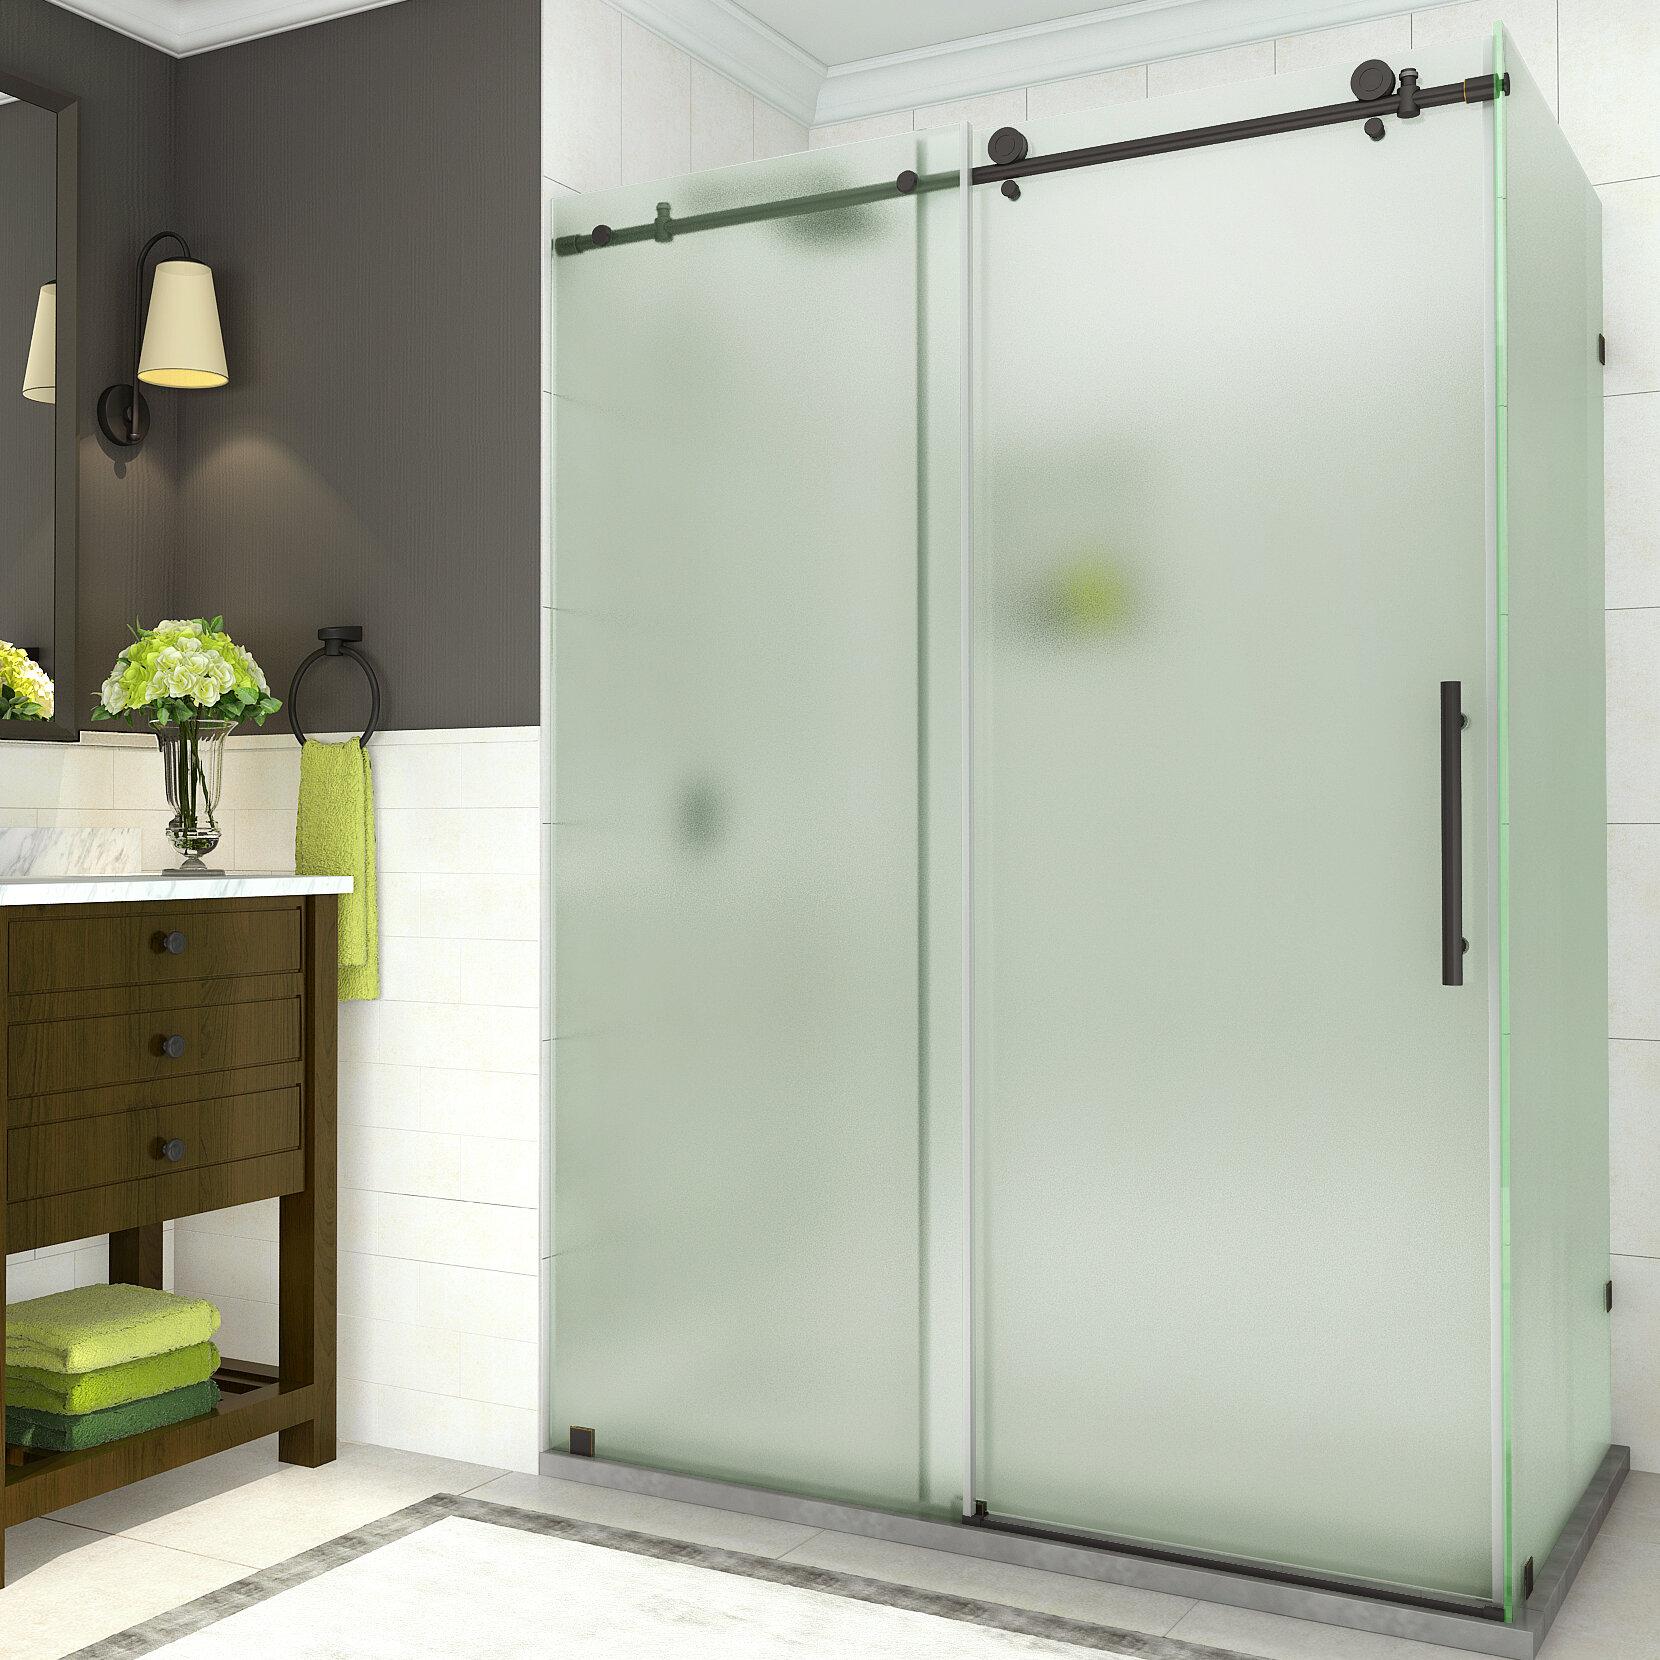 Details About Aston Coraline 60 X 76 Single Sliding Frameless Shower Door Oil Rubbed Bronze